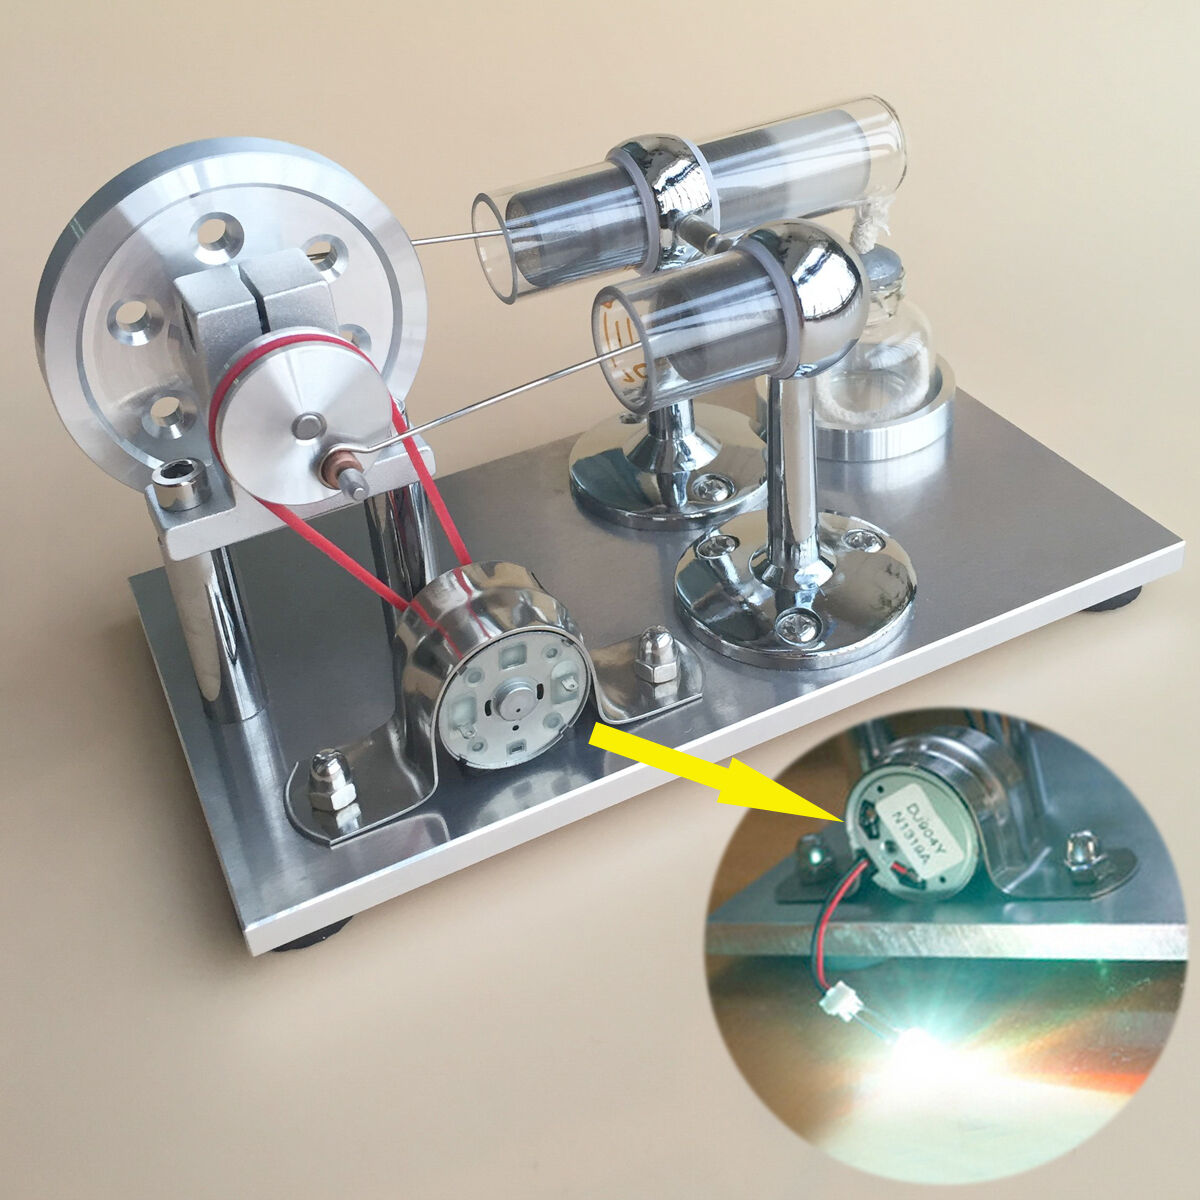 Caliente Air Stirling Engine modello Physics Education Micor energia Generator Engine giocattolo